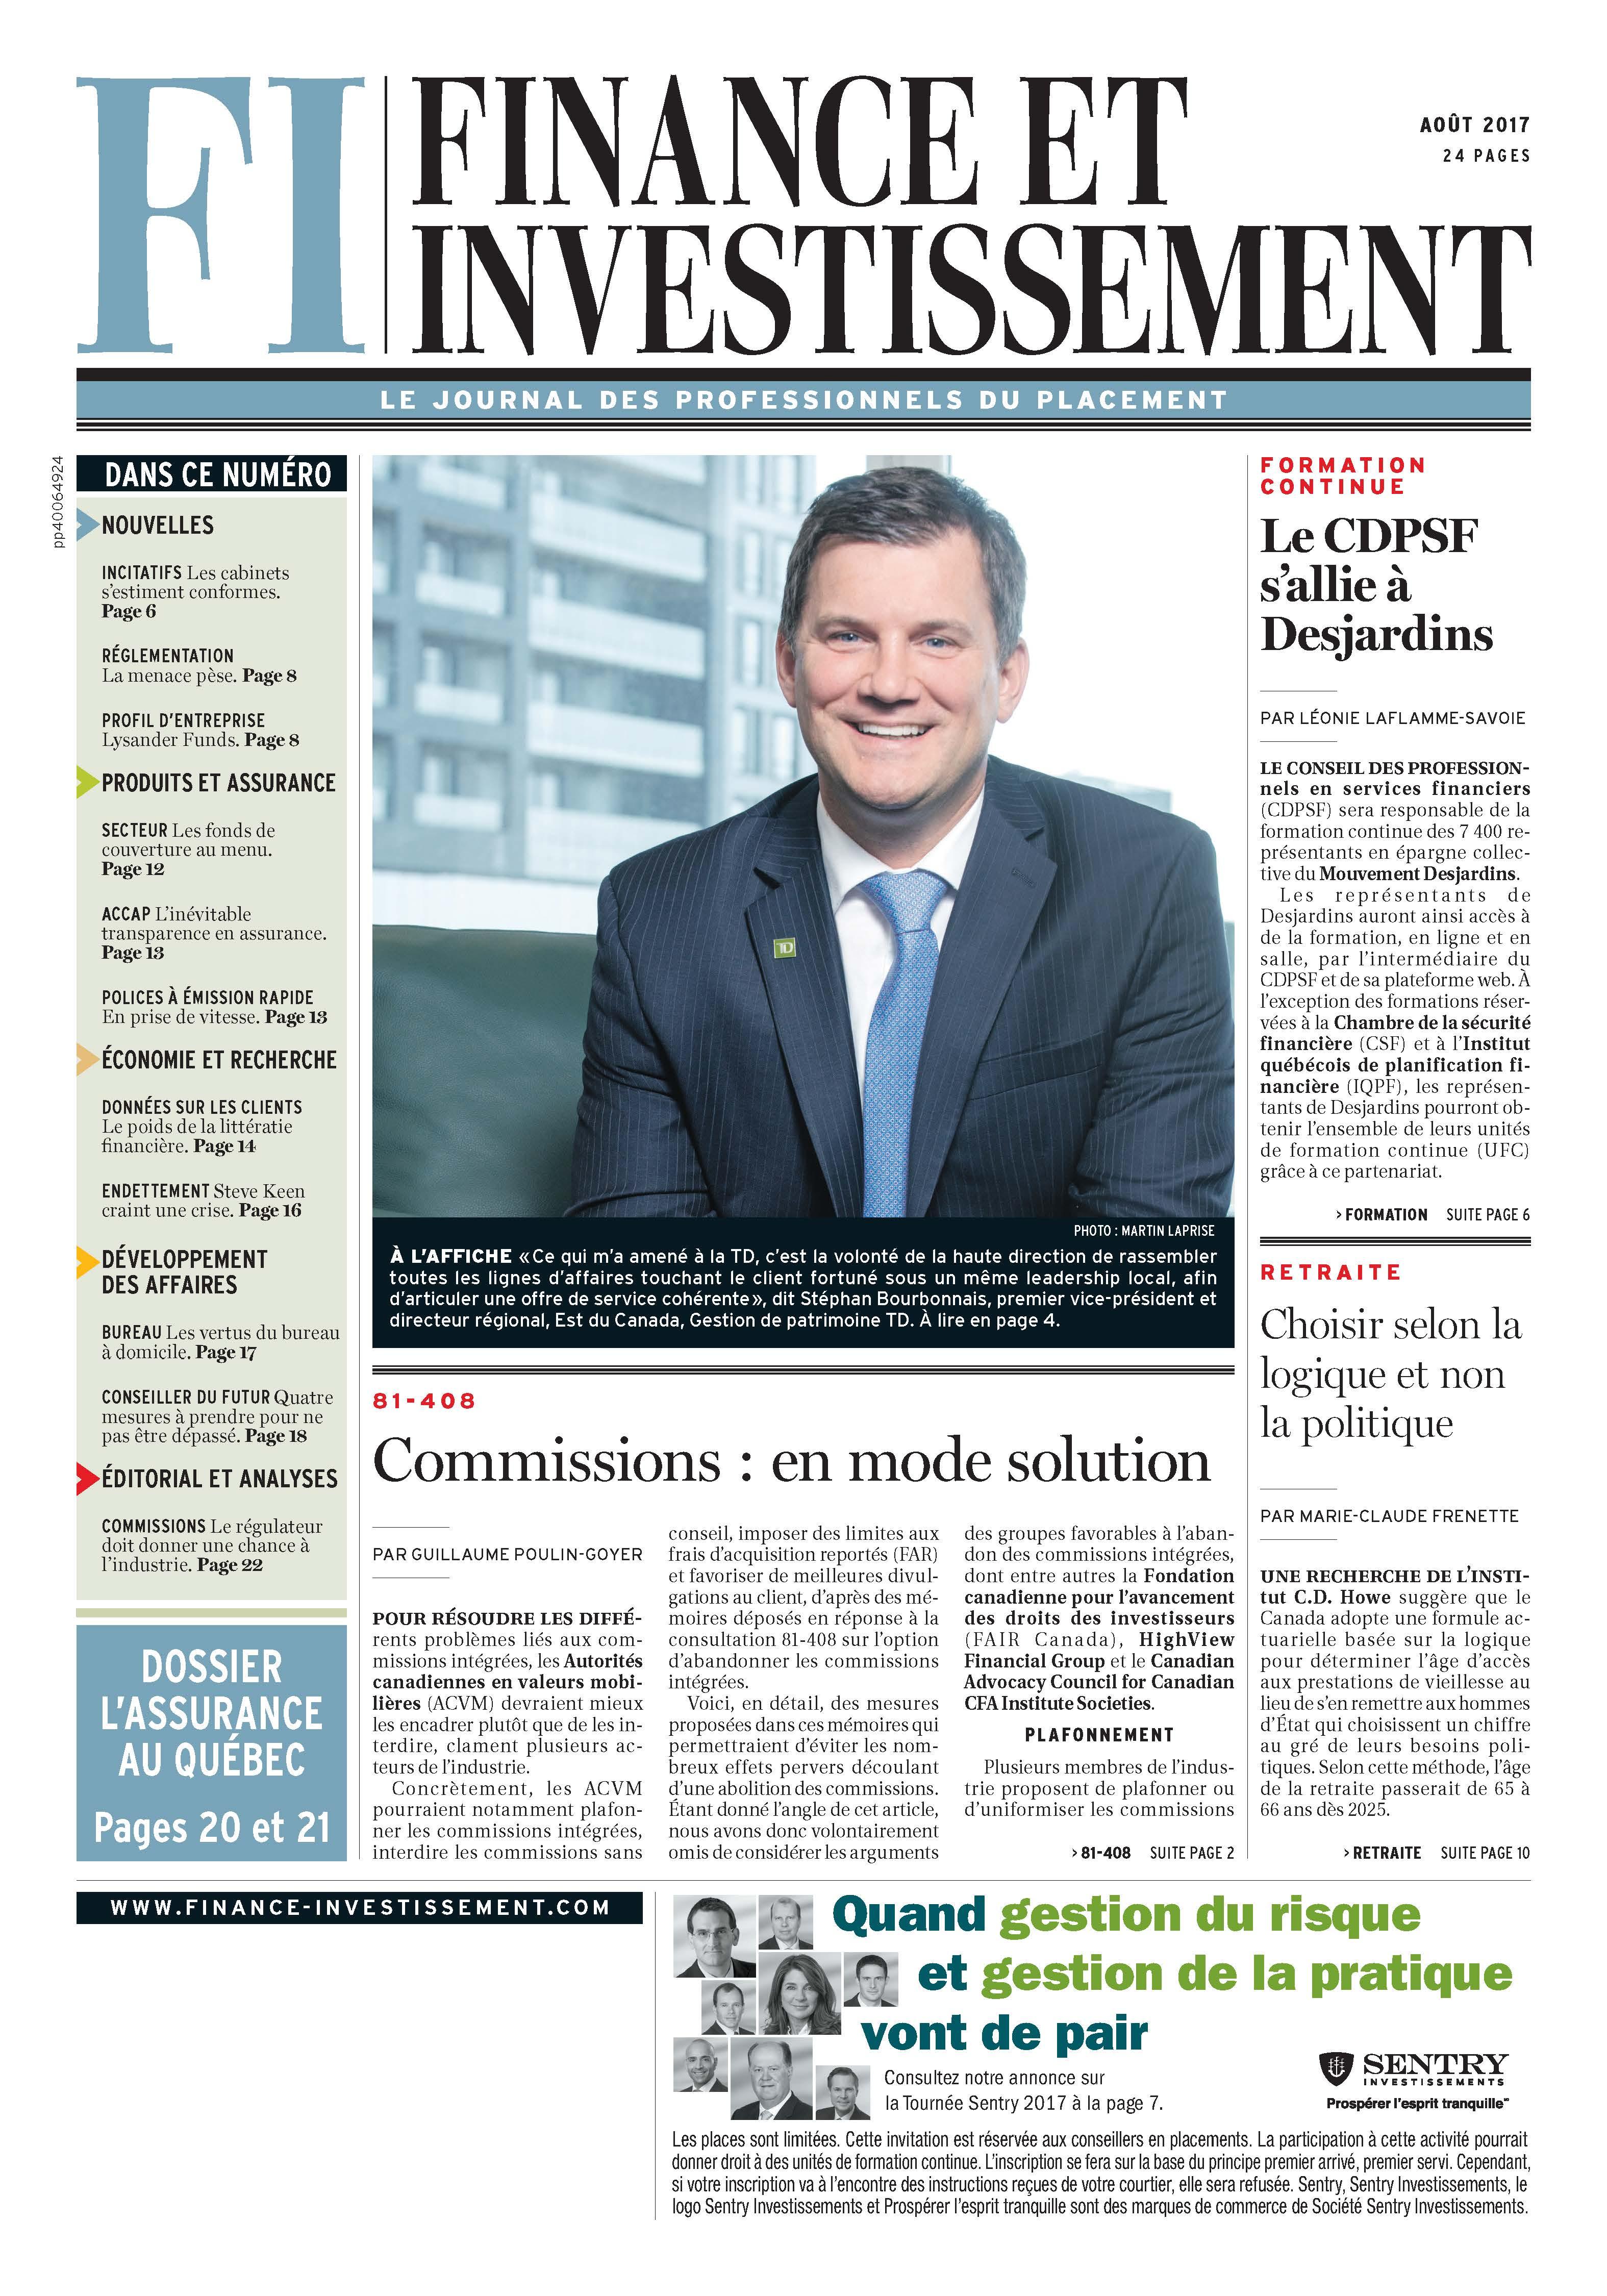 Finance et Investissement – 1 août 2017